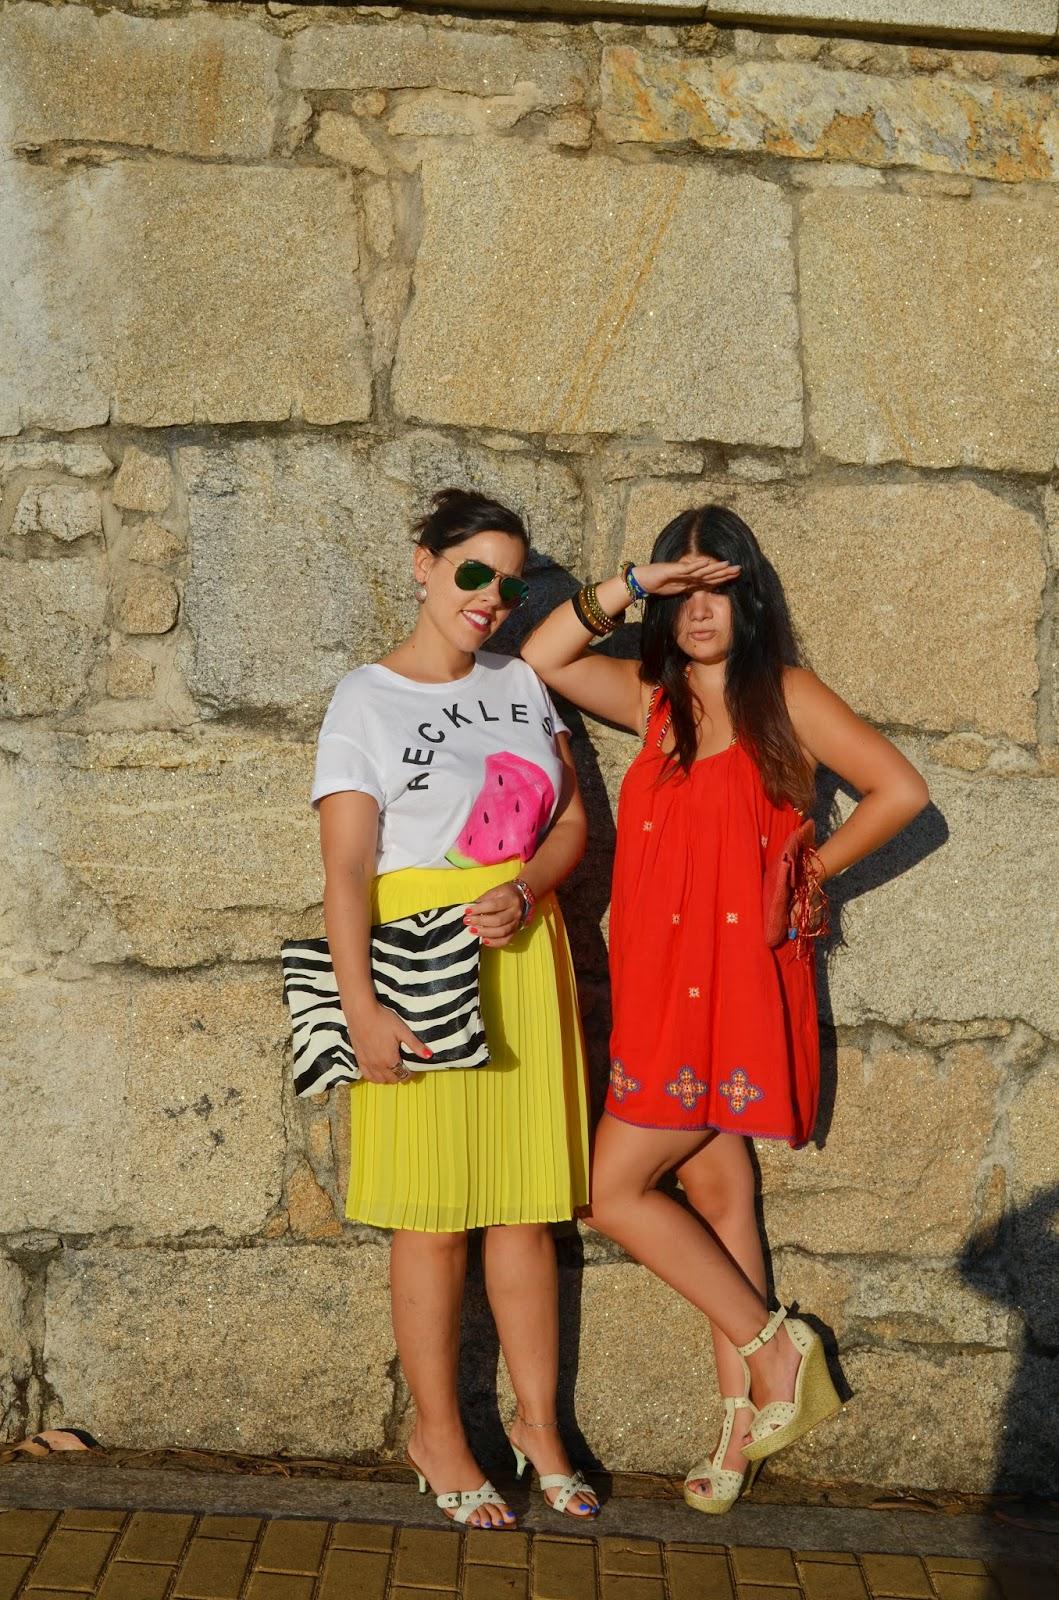 http://amigasyresidentesenstylestation.blogspot.com.es/2014/07/paseando-desde-la-etea-hasta-la-lagoa.html